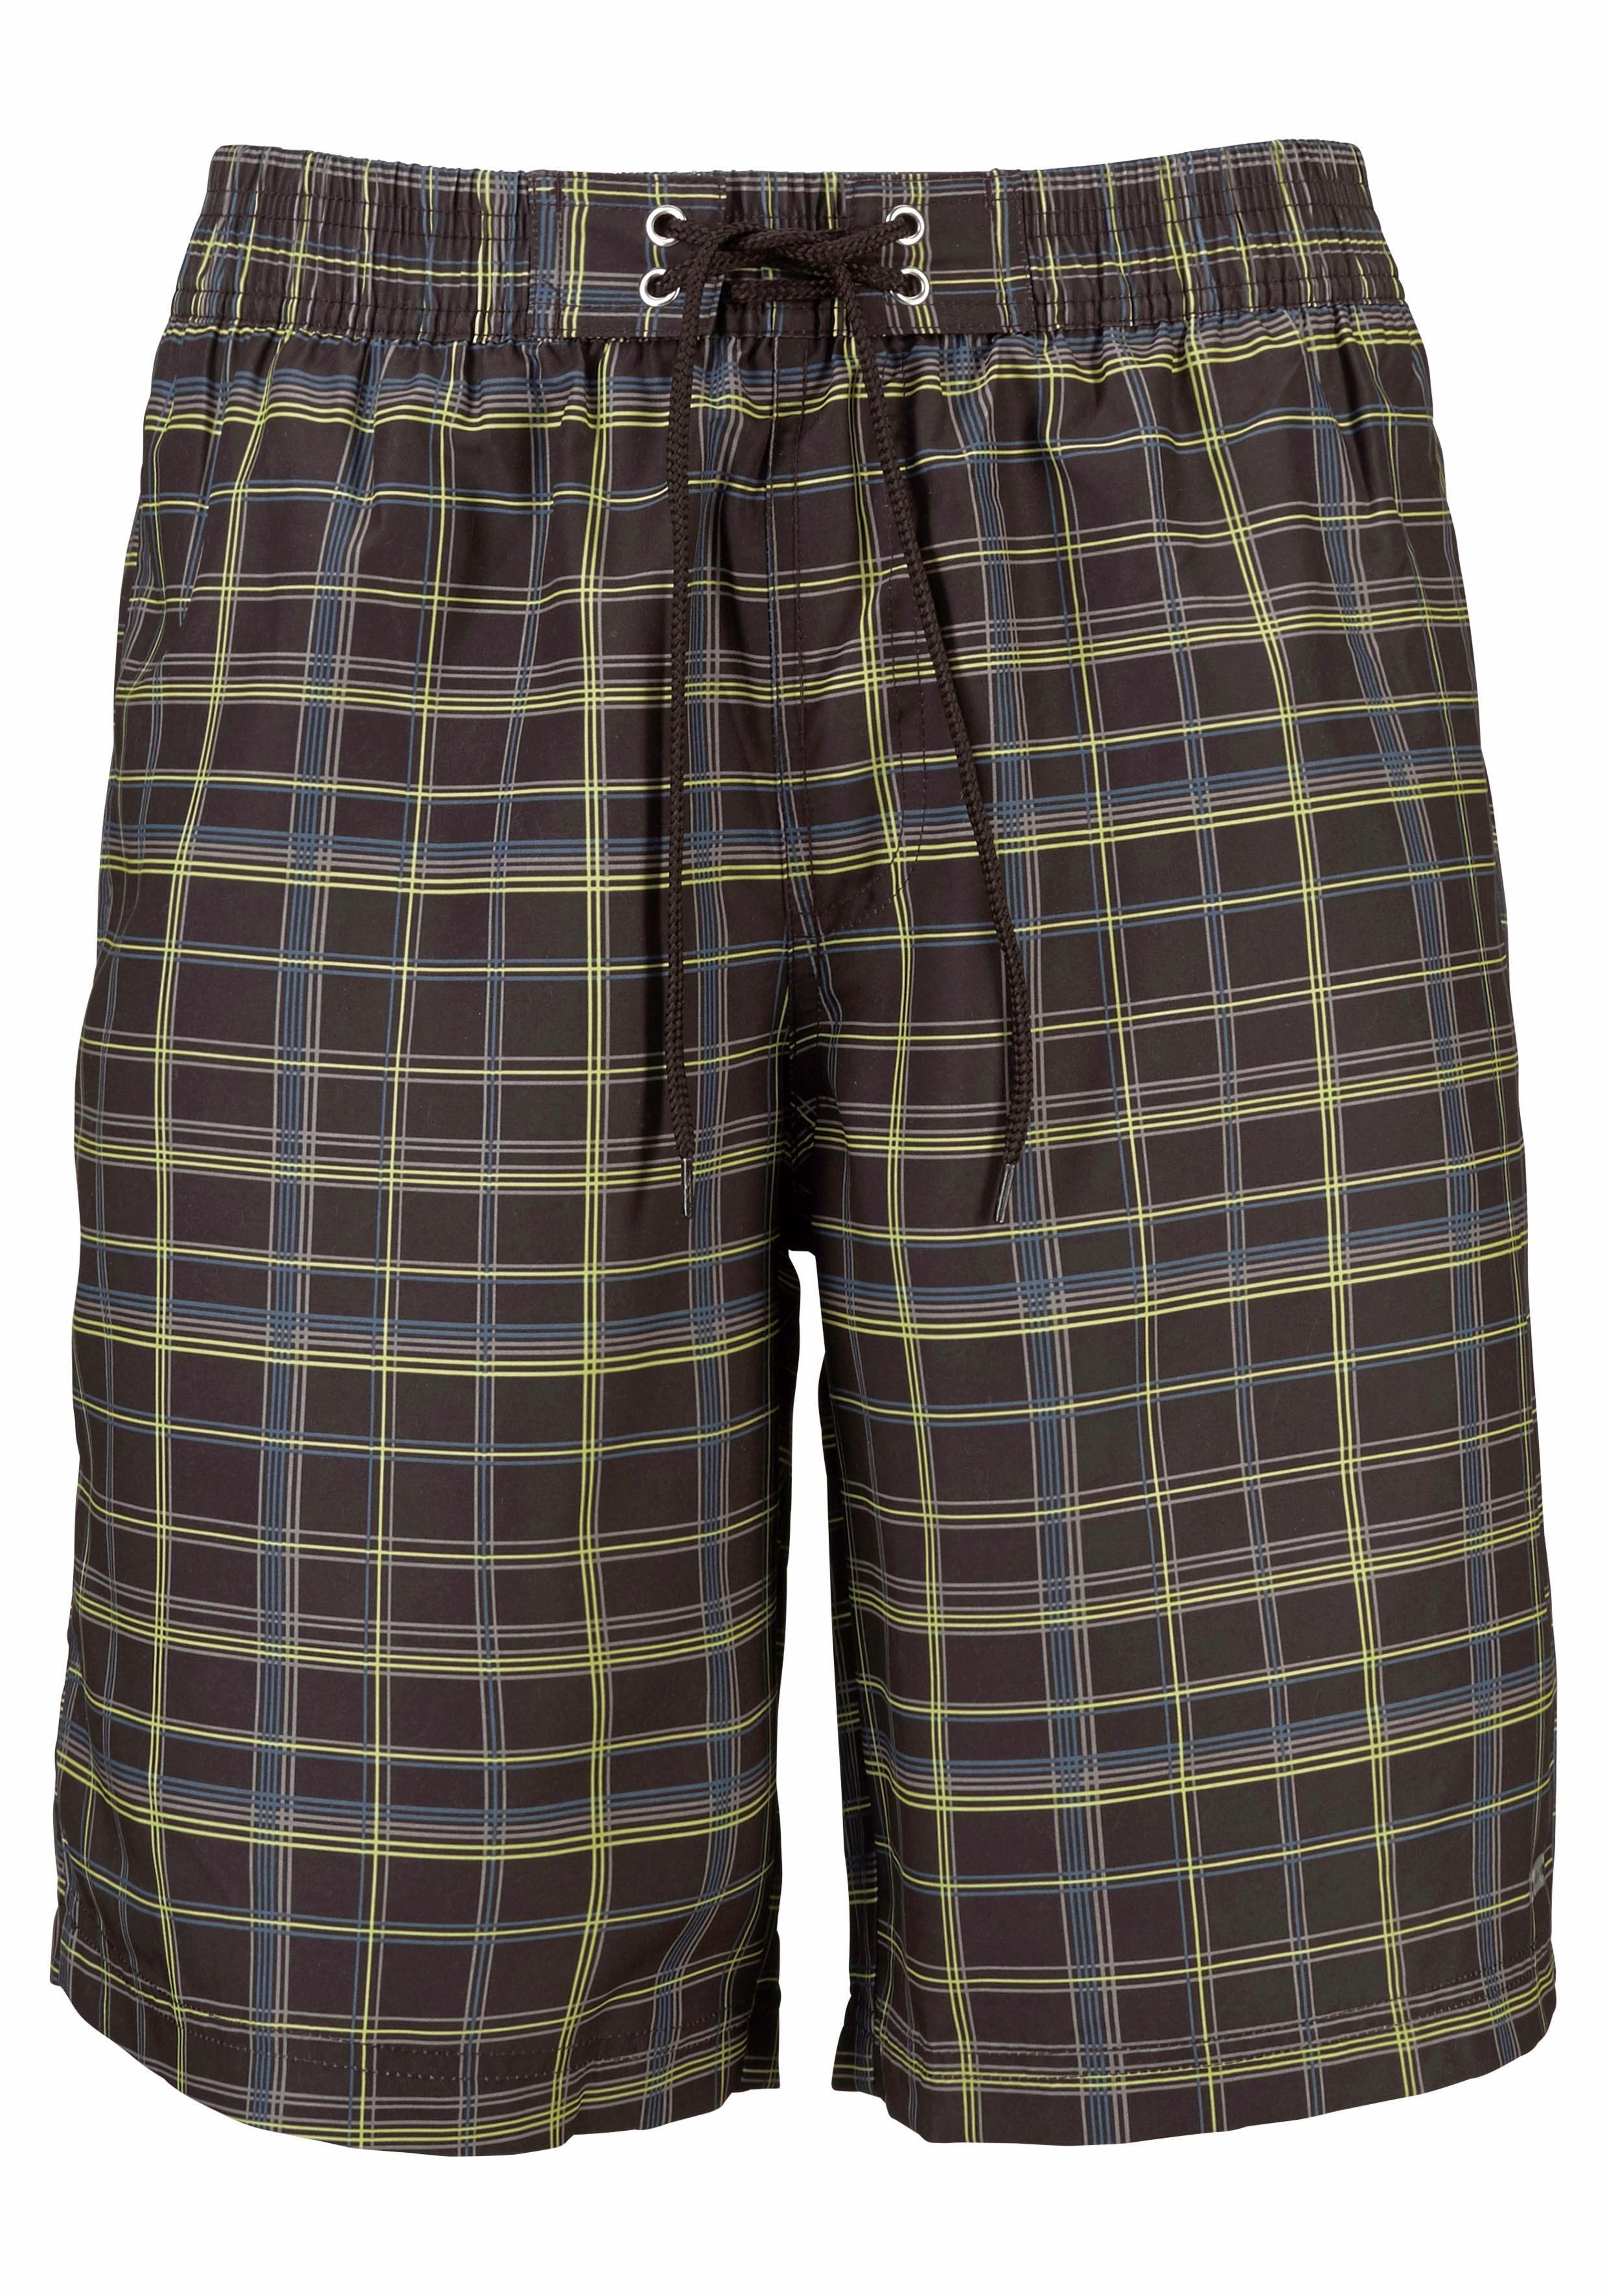 s.Oliver RED LABEL Beachwear Badeshorts mit kariertem Druck   Bekleidung > Shorts & Bermudas > Shorts   Braun   s.Oliver RED LABEL Beachwear